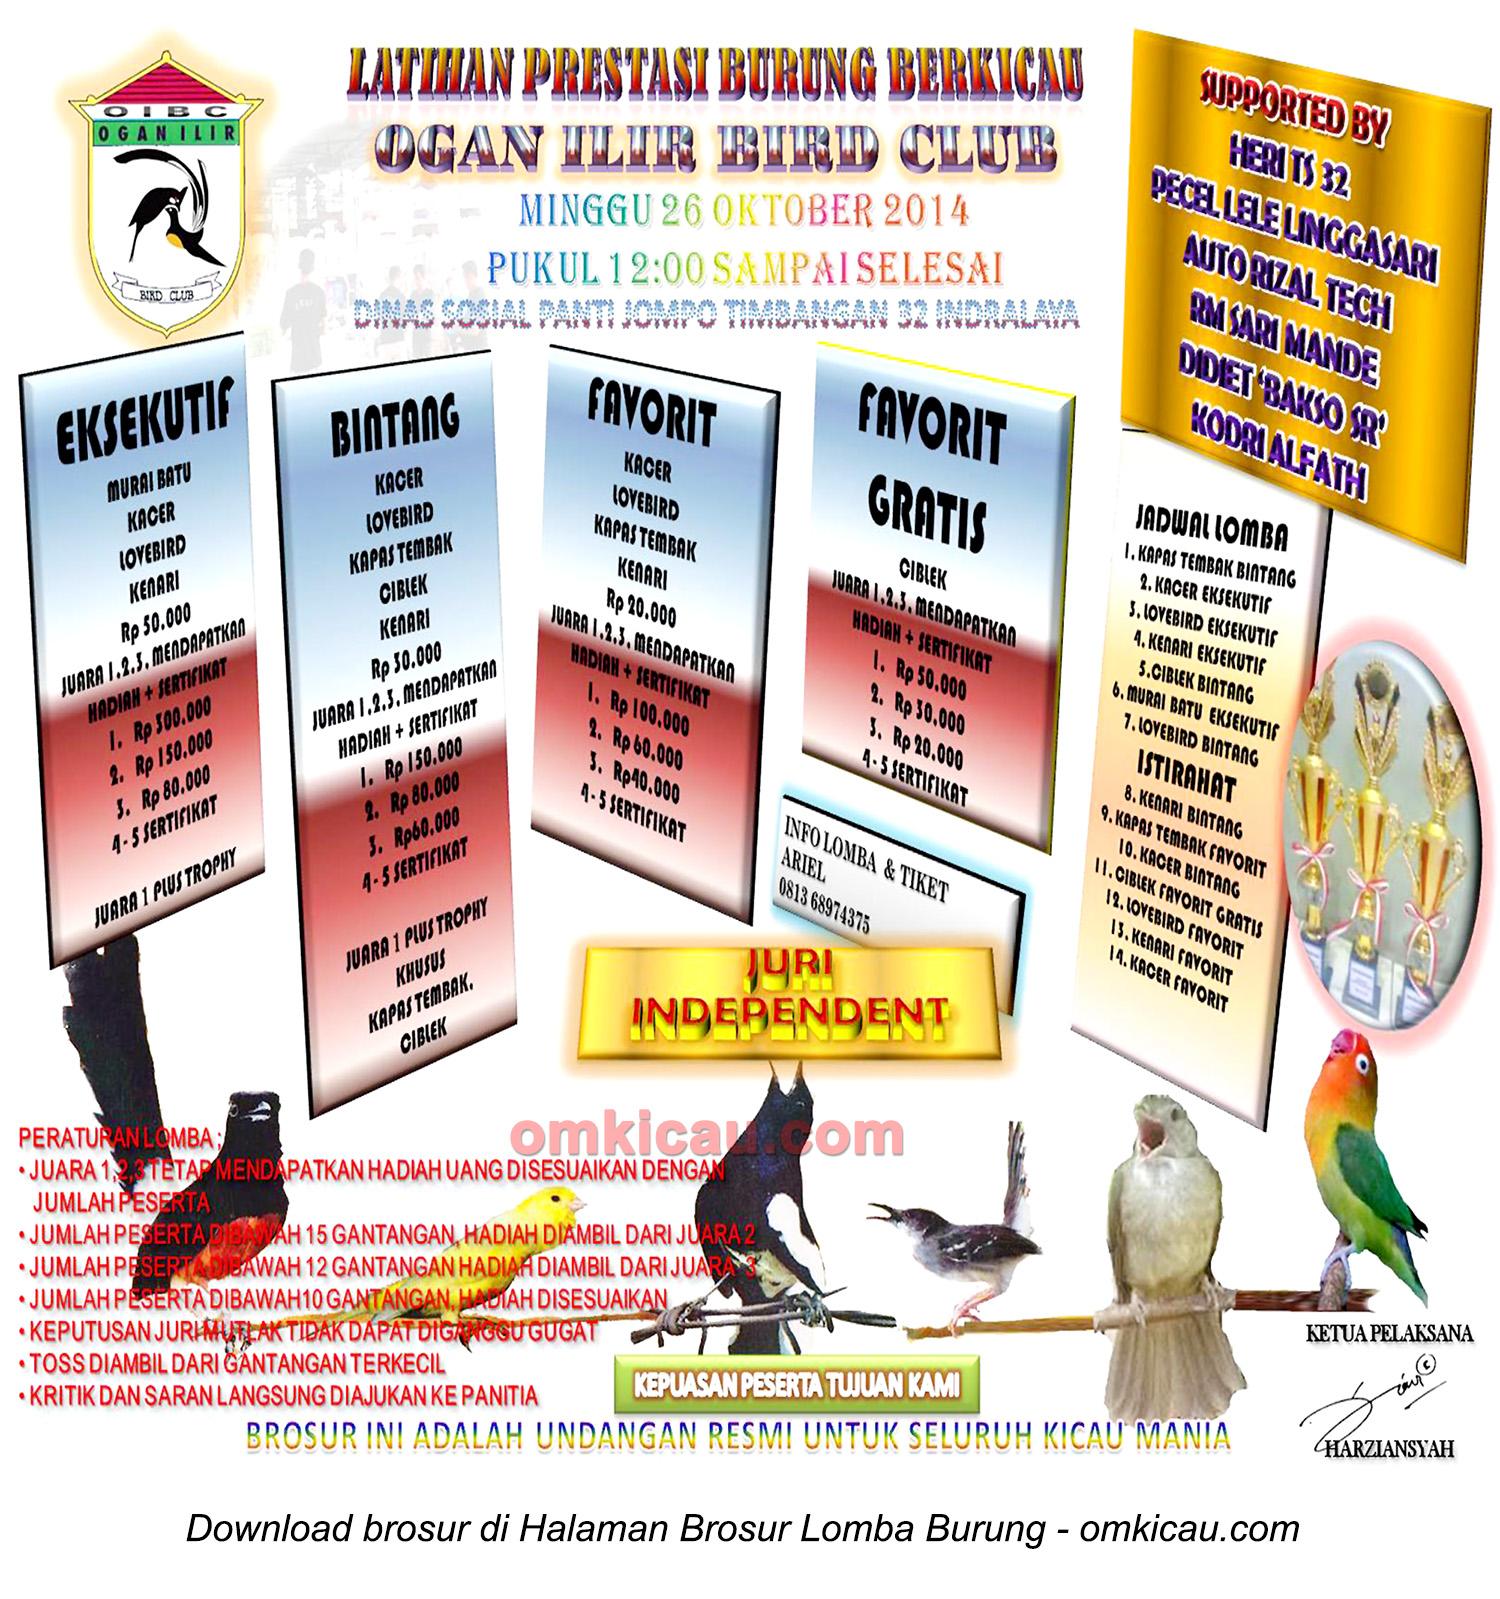 Brosur Latpres Burung Berkicau Ogan Ilir BC, Indralaya, 26 Oktober 2014